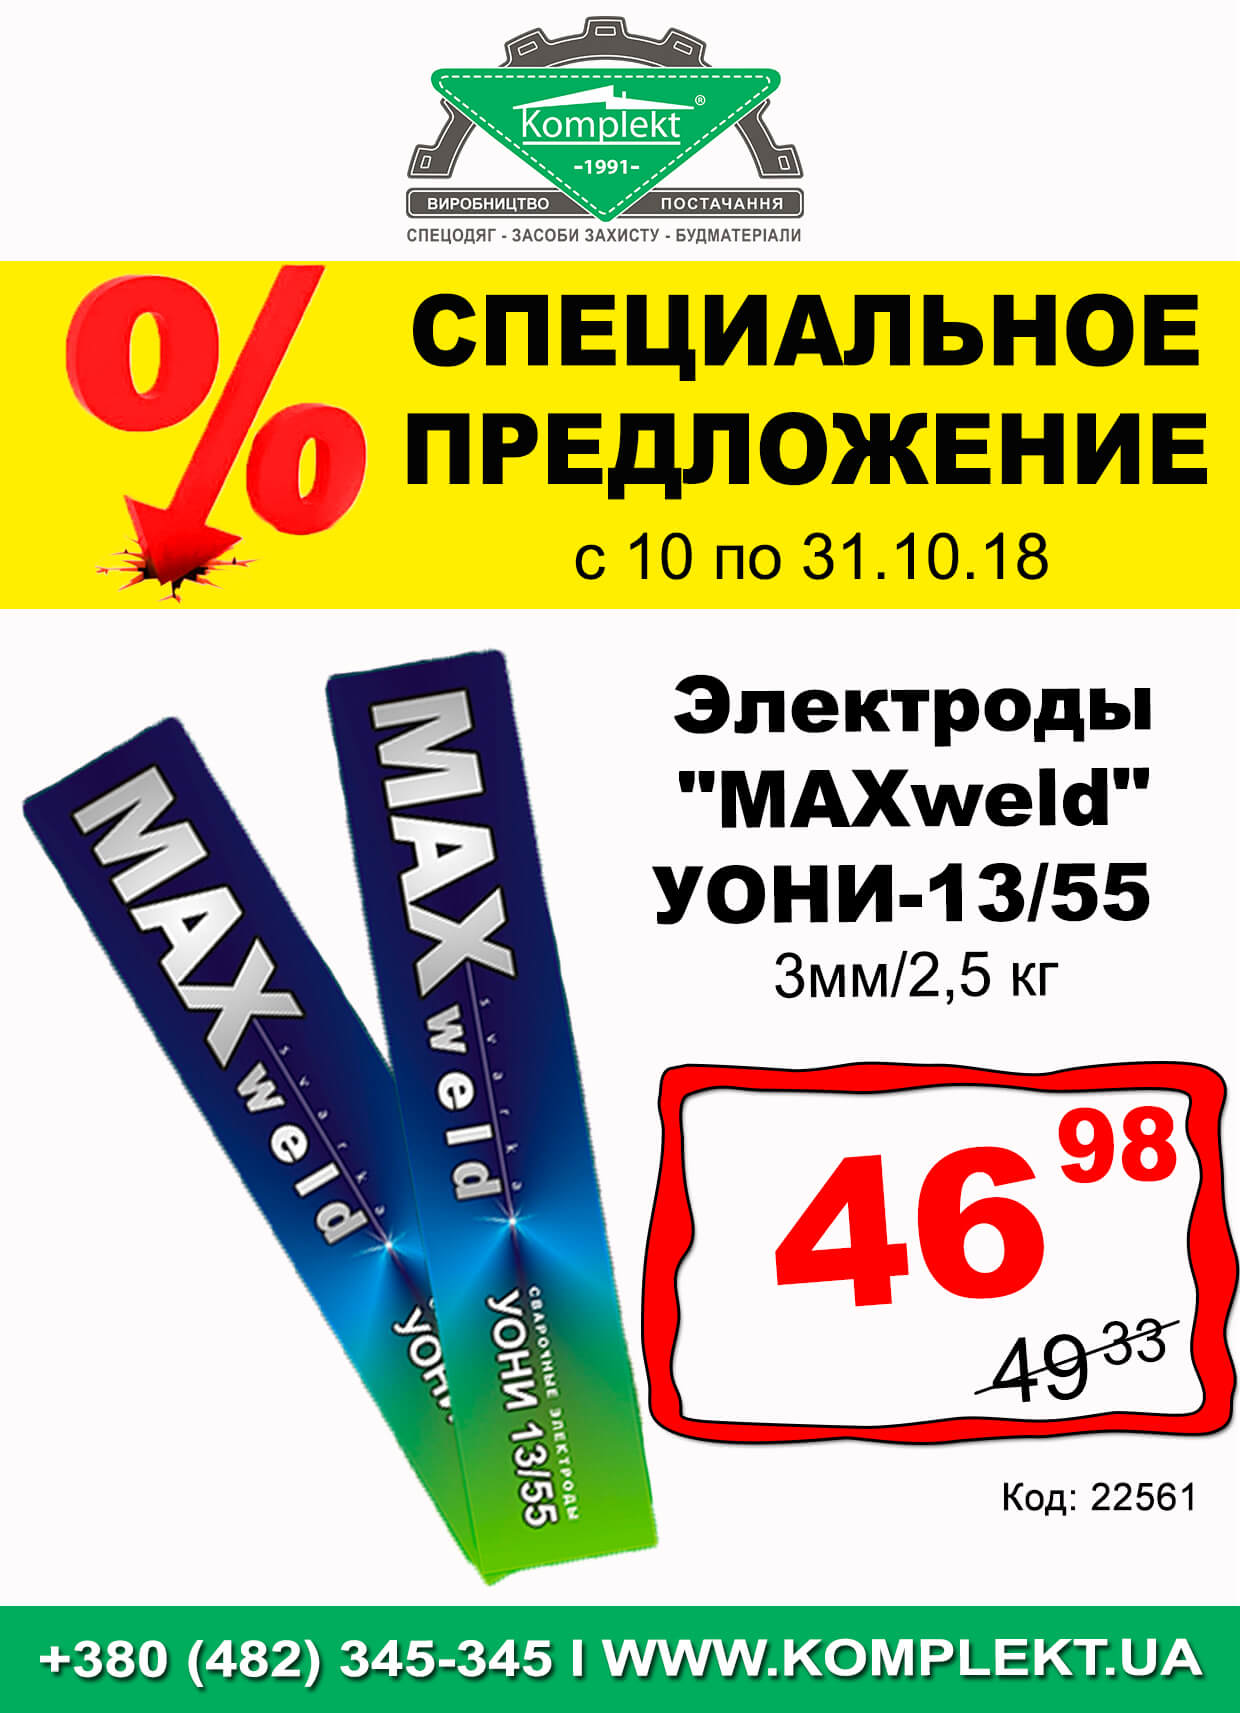 электроды Maxweld уони -13/55